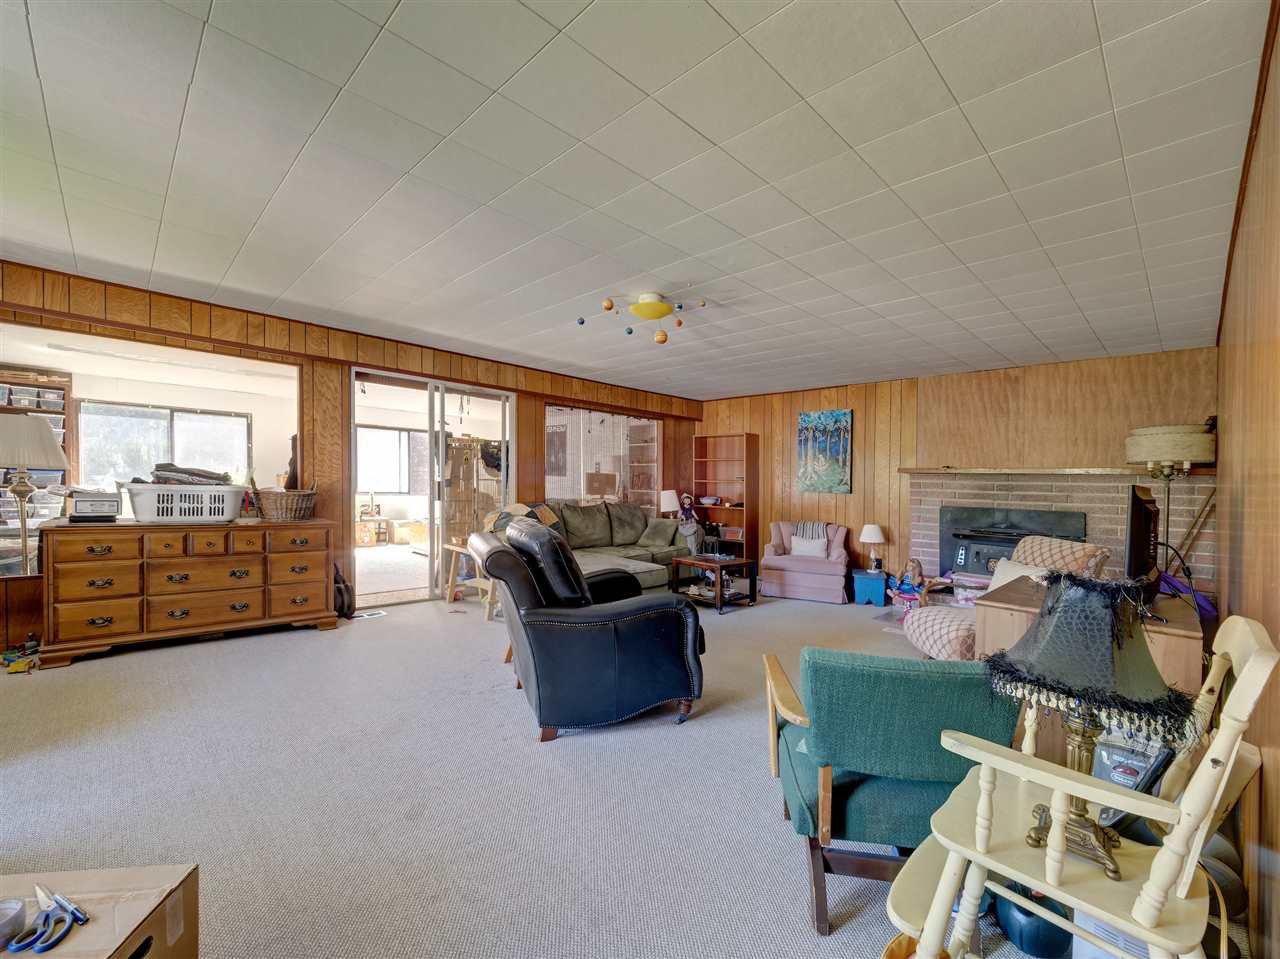 Photo 14: Photos: 5761 MCLAUGHAN Road in Sechelt: Sechelt District House for sale (Sunshine Coast)  : MLS®# R2479077